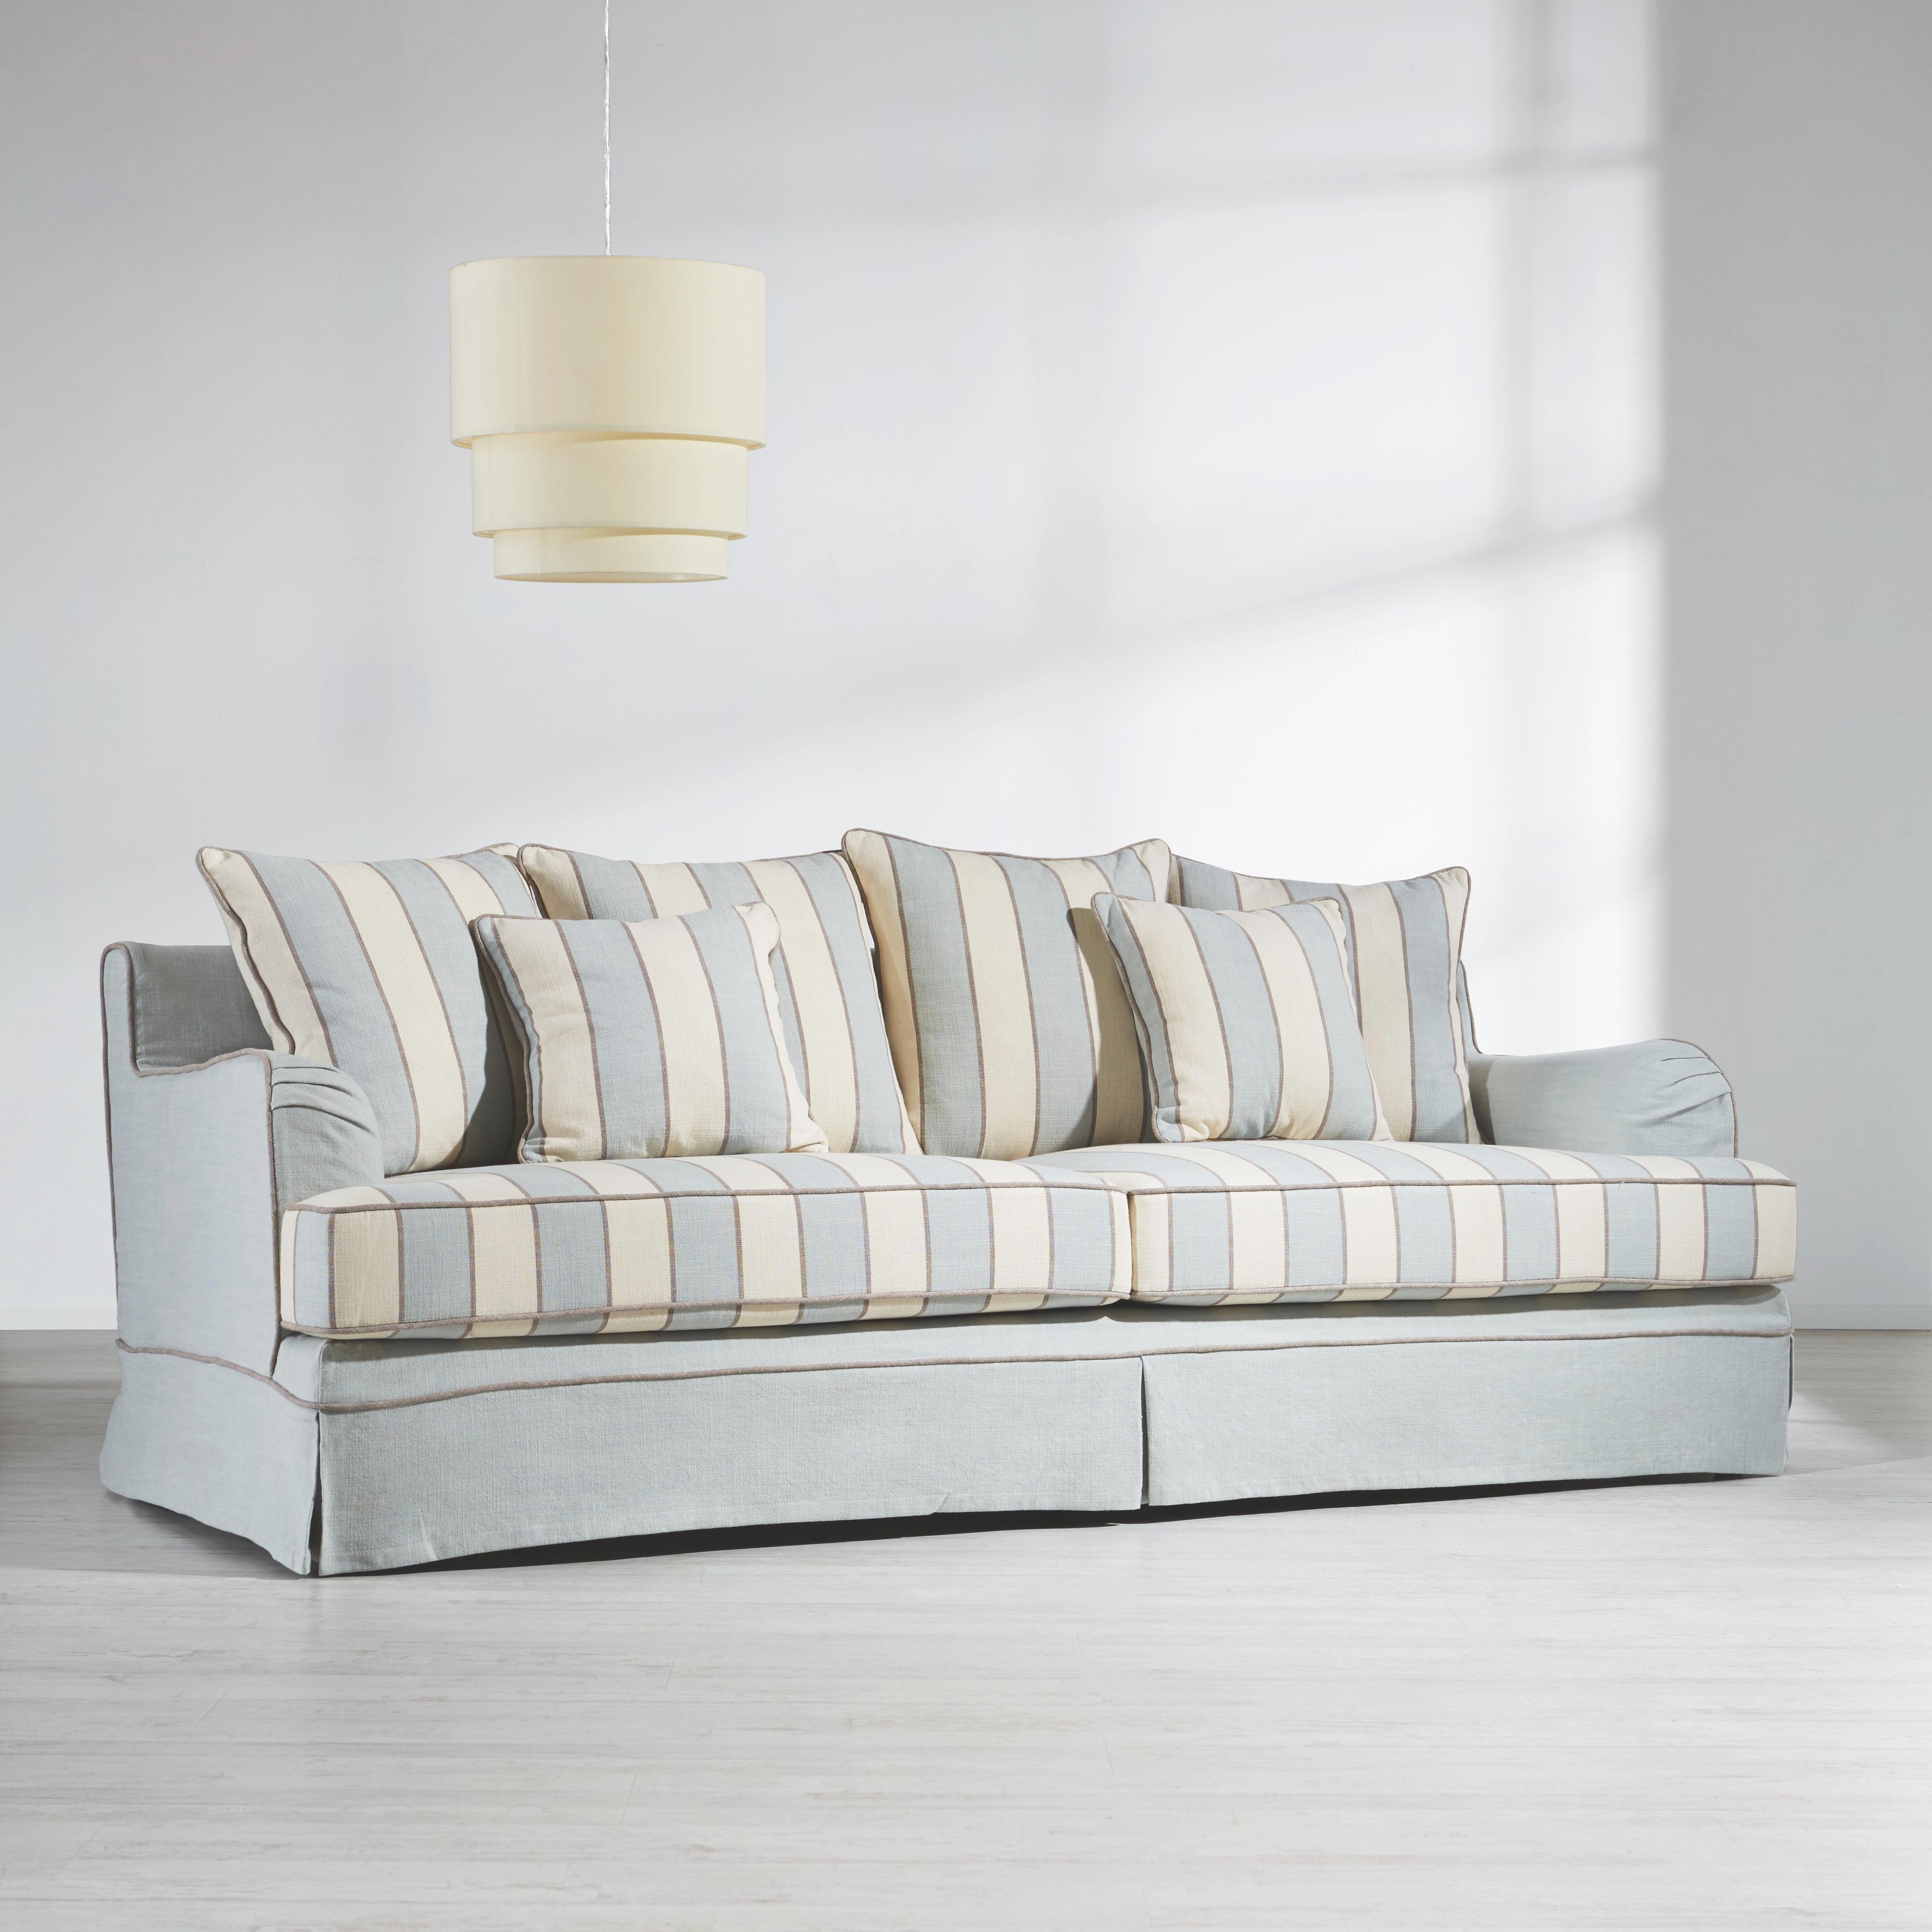 Viersitzer Sofa New Hampton - Naturfarben/Hellblau, KONVENTIONELL, Holz/Textil (220/70/96cm) - PREMIUM LIVING